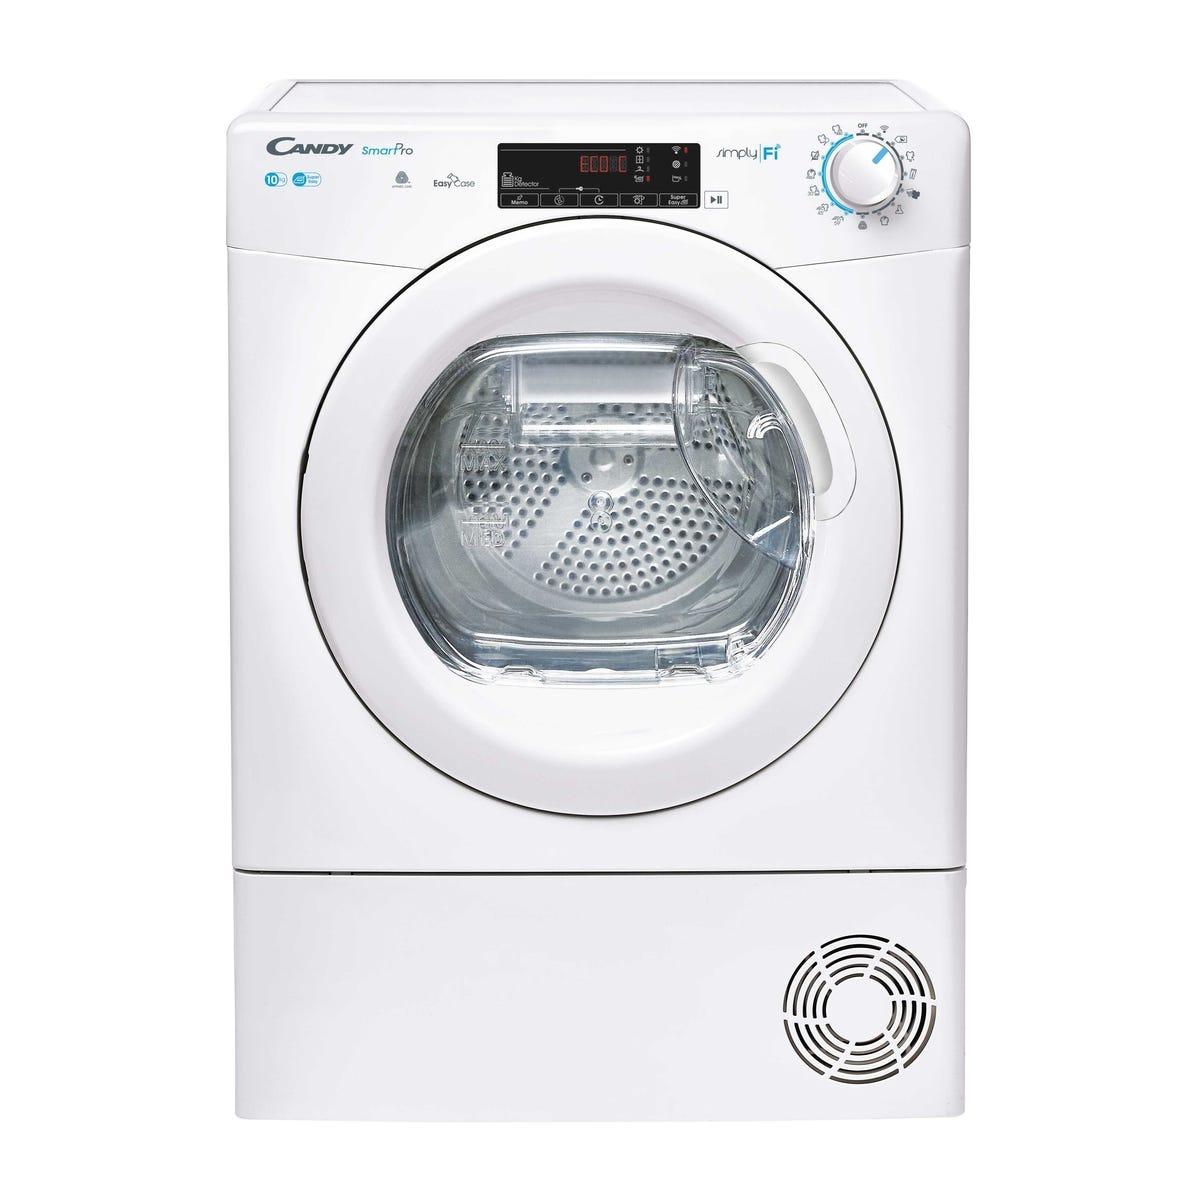 Candy CSO C10TE Smart Pro 10kg Condenser Tumble Dryer with EasyCase - White